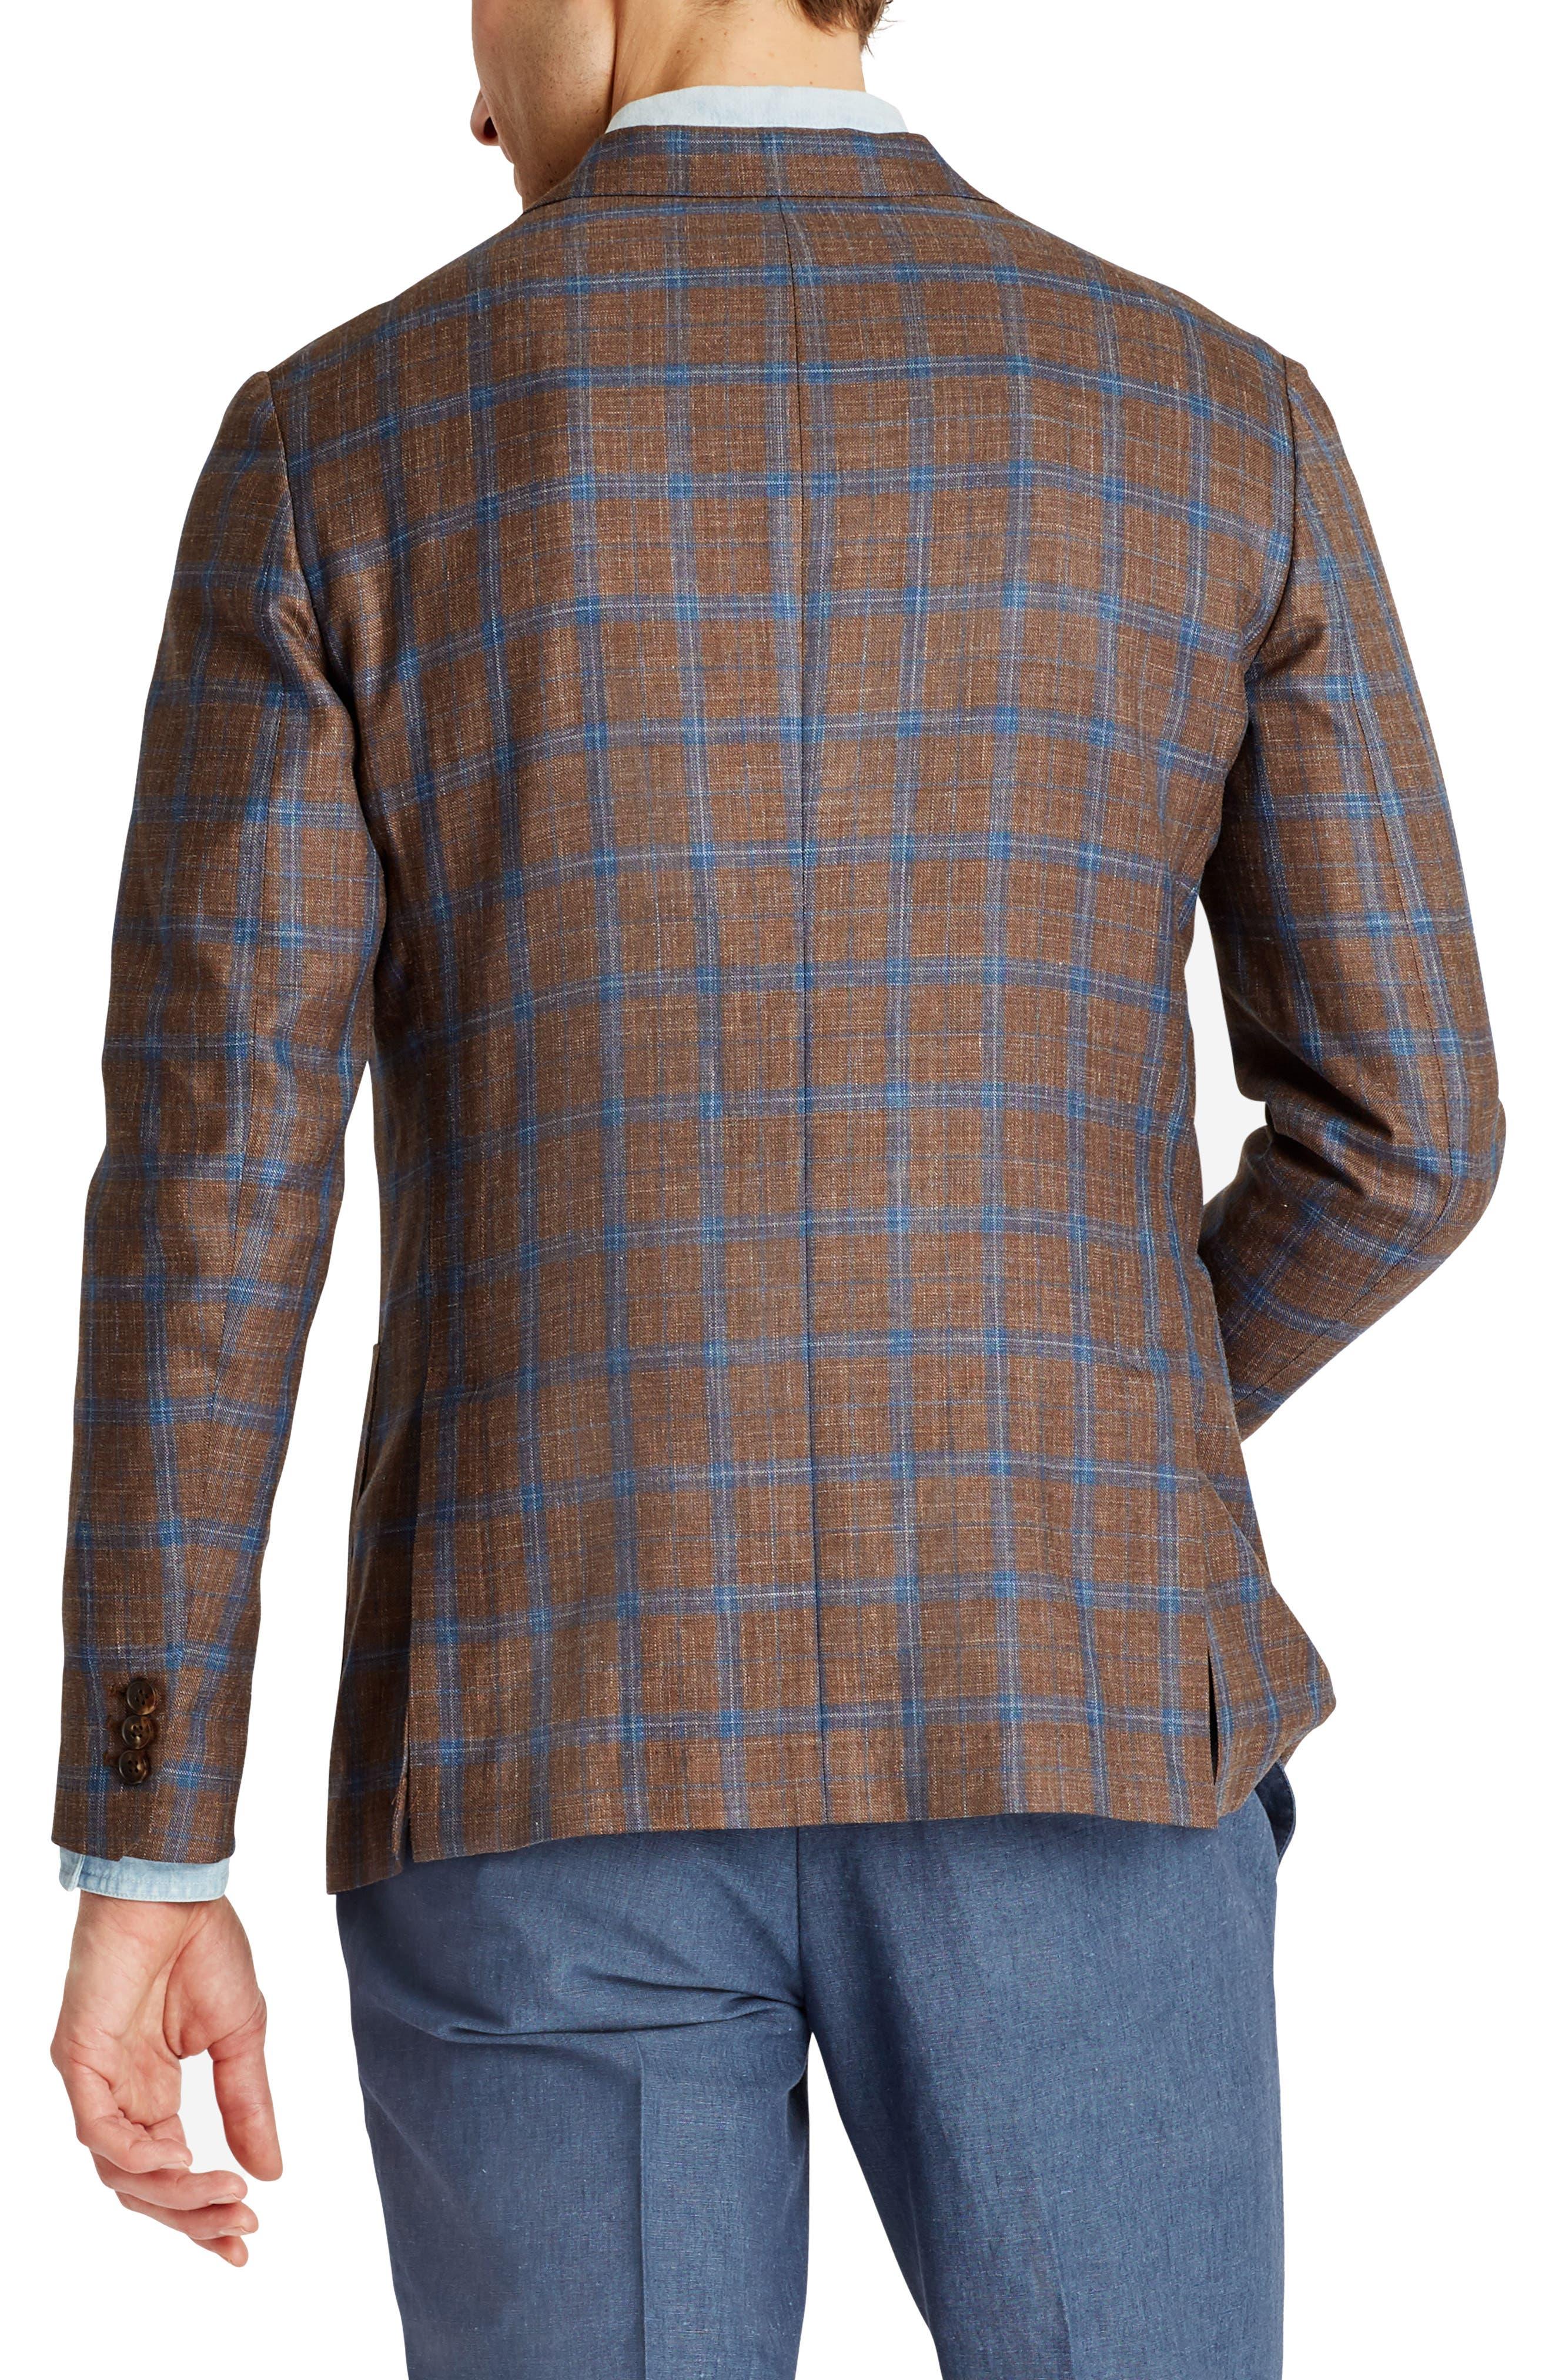 Capstone Slim Fit Plaid Wool Blend Sport Coat,                             Alternate thumbnail 2, color,                             200